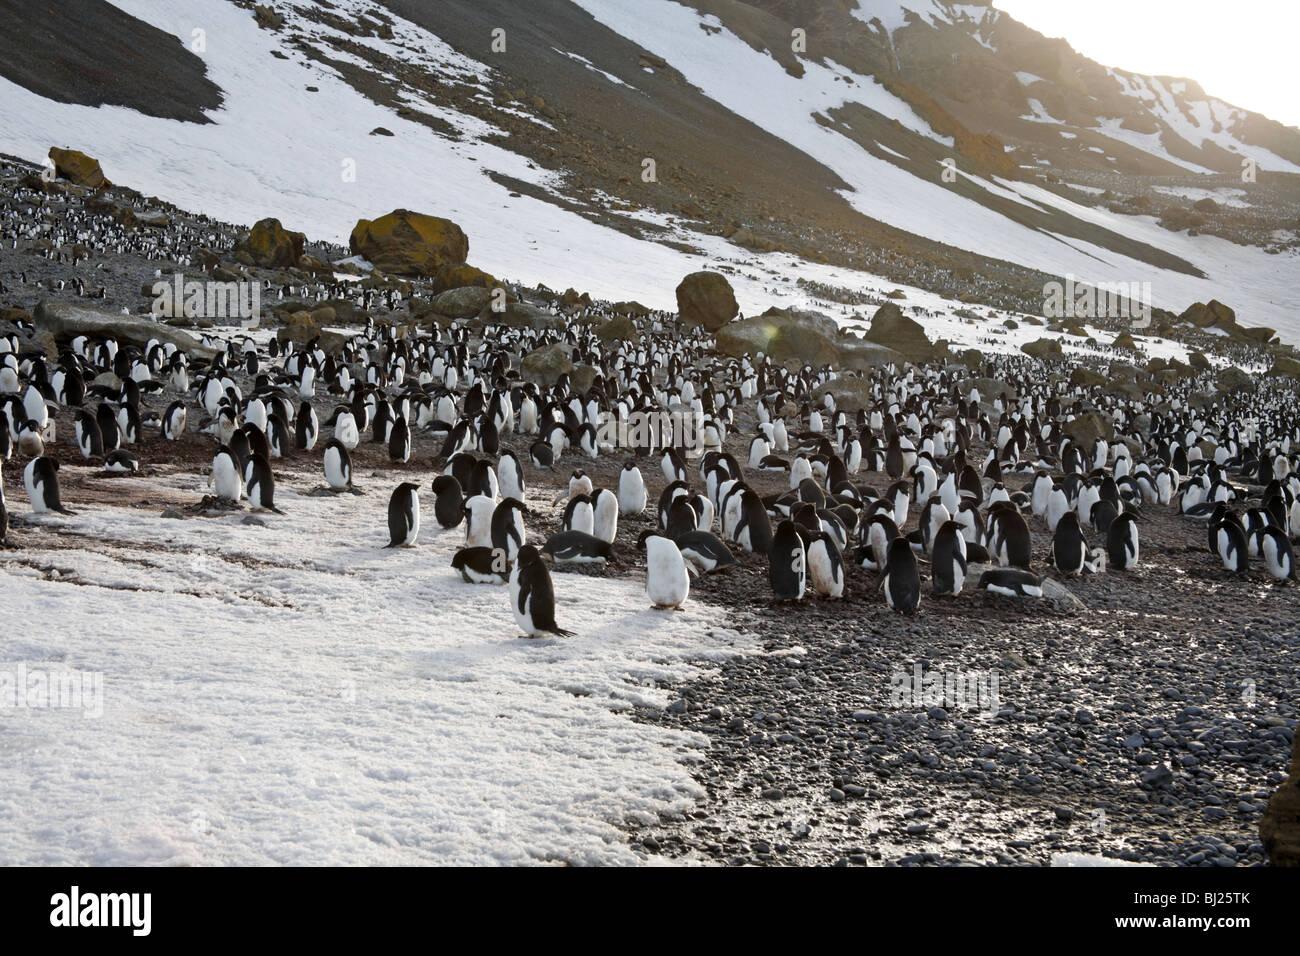 Adelie Penguin, Pygoscelis adeliae, colony at Brown Bluff, Antarctic peninsula - Stock Image